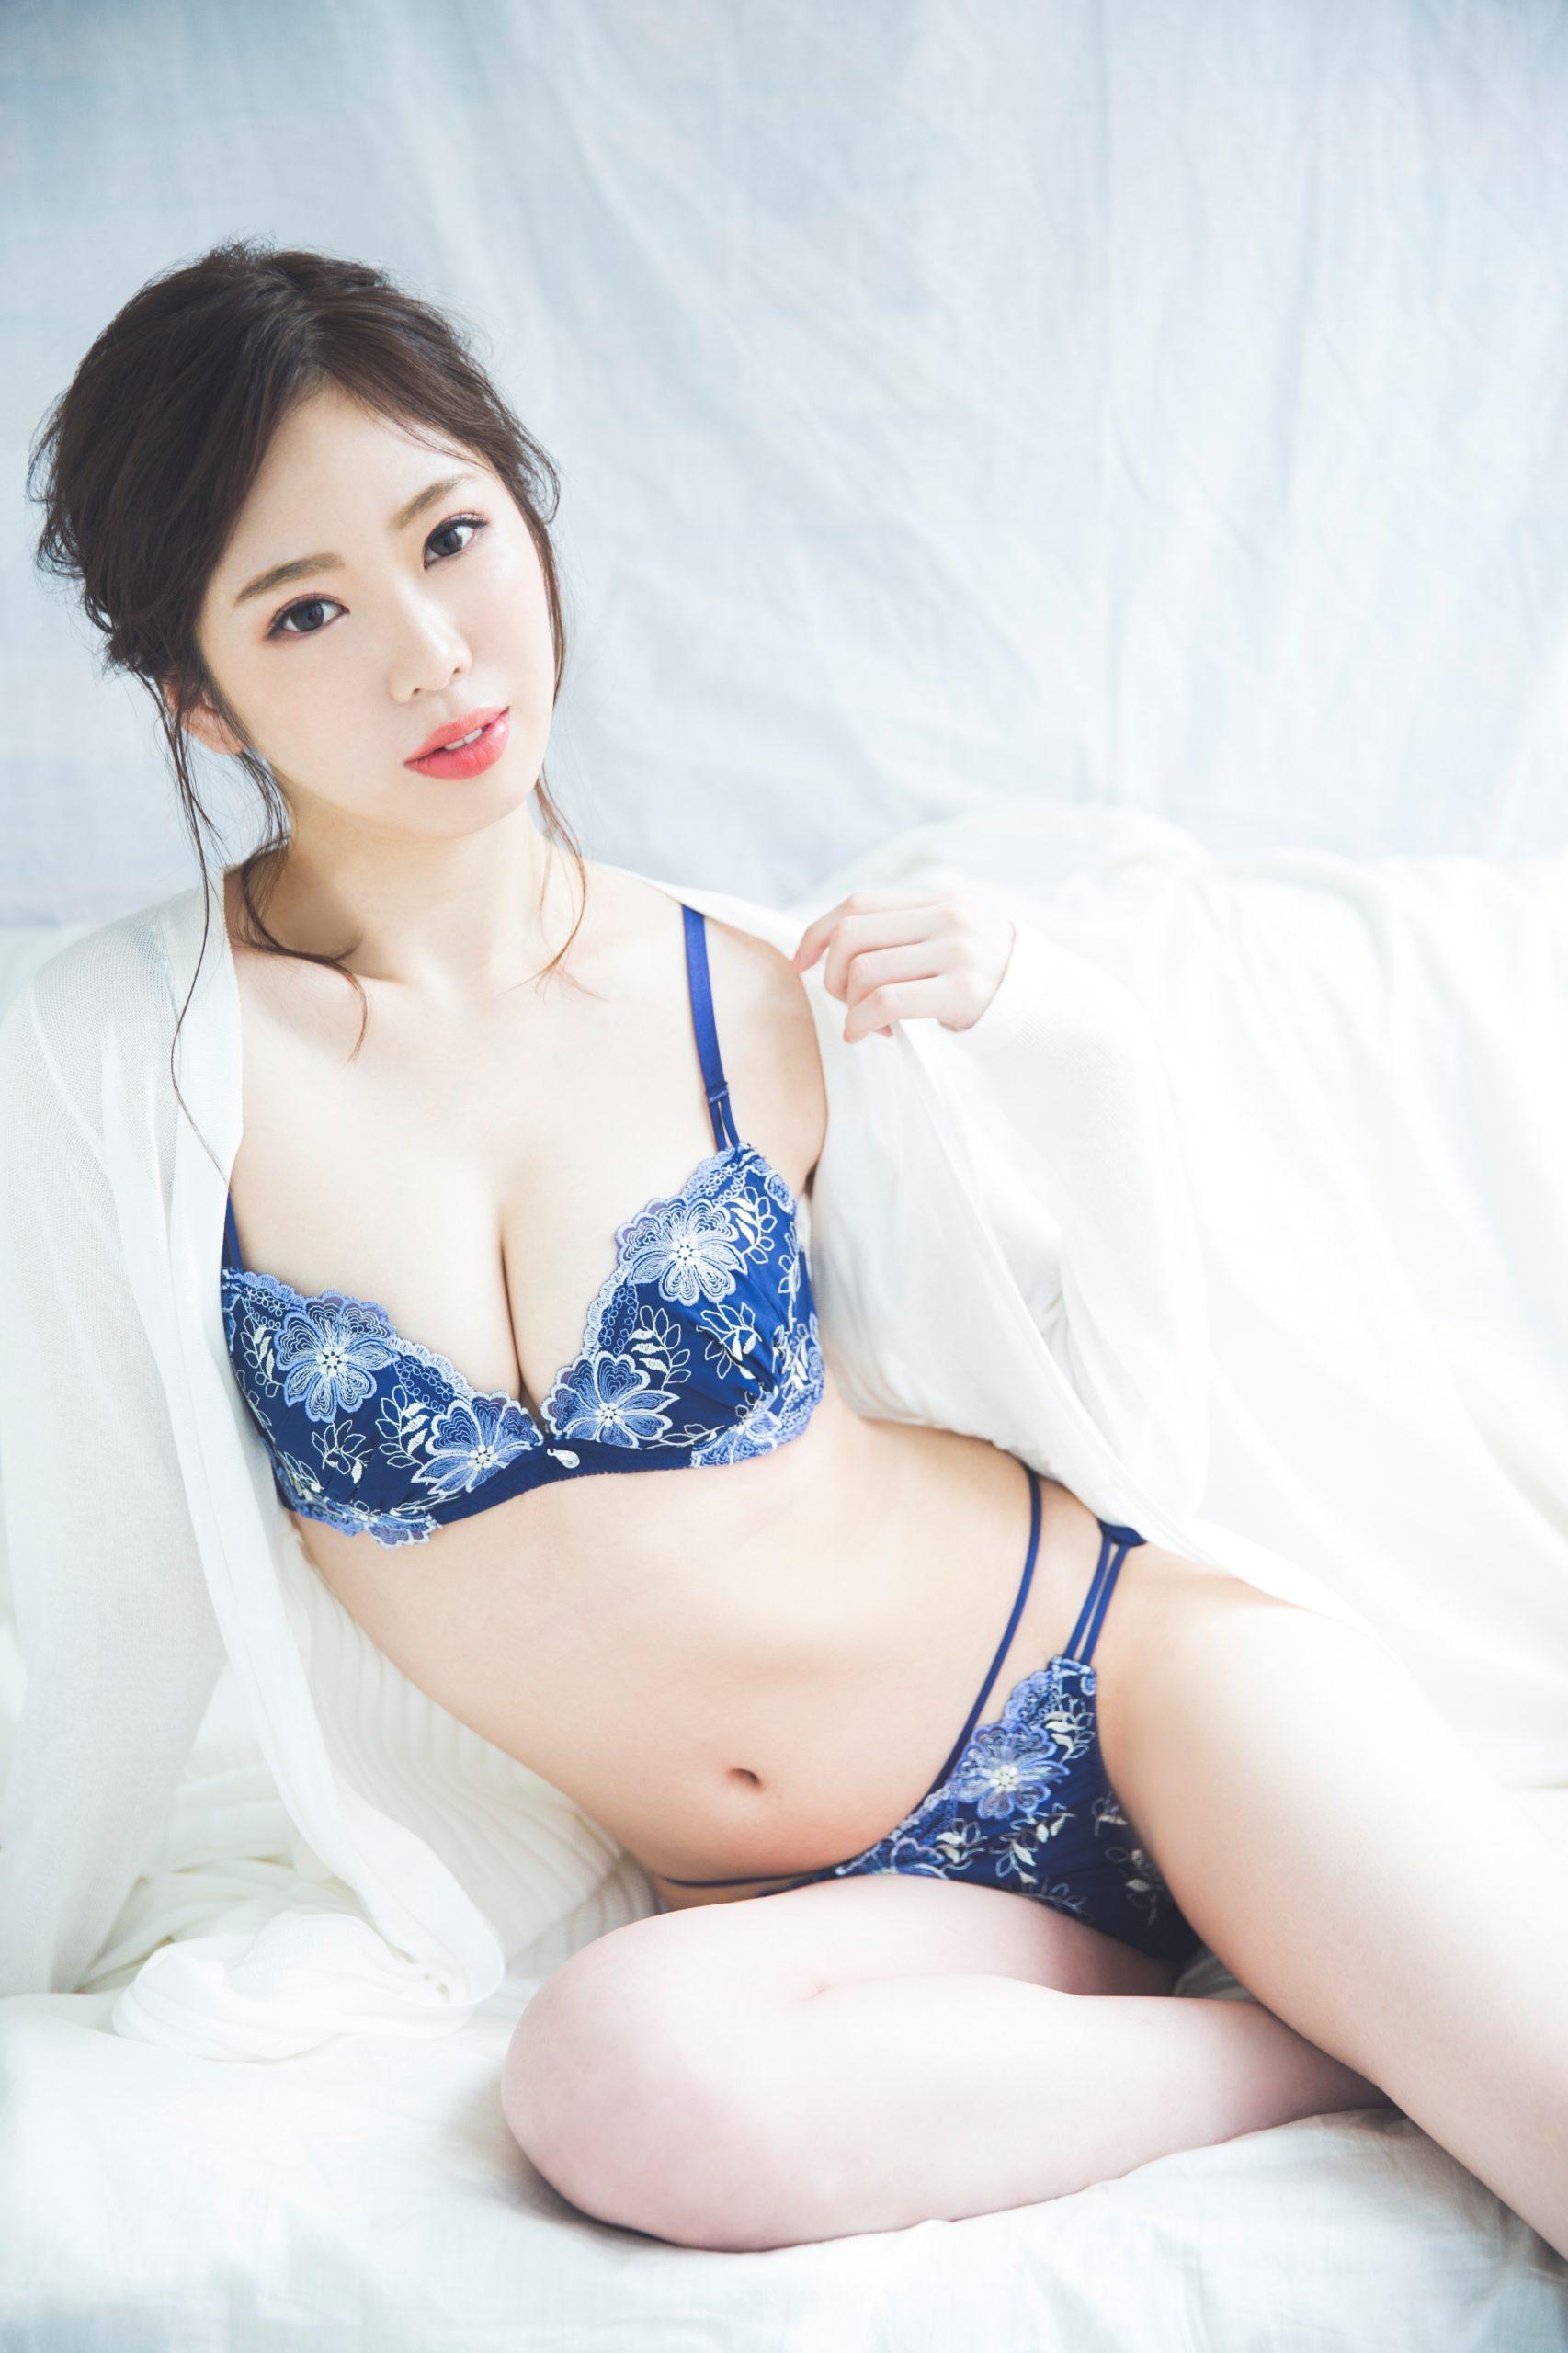 umeko_misaki_s_t_04